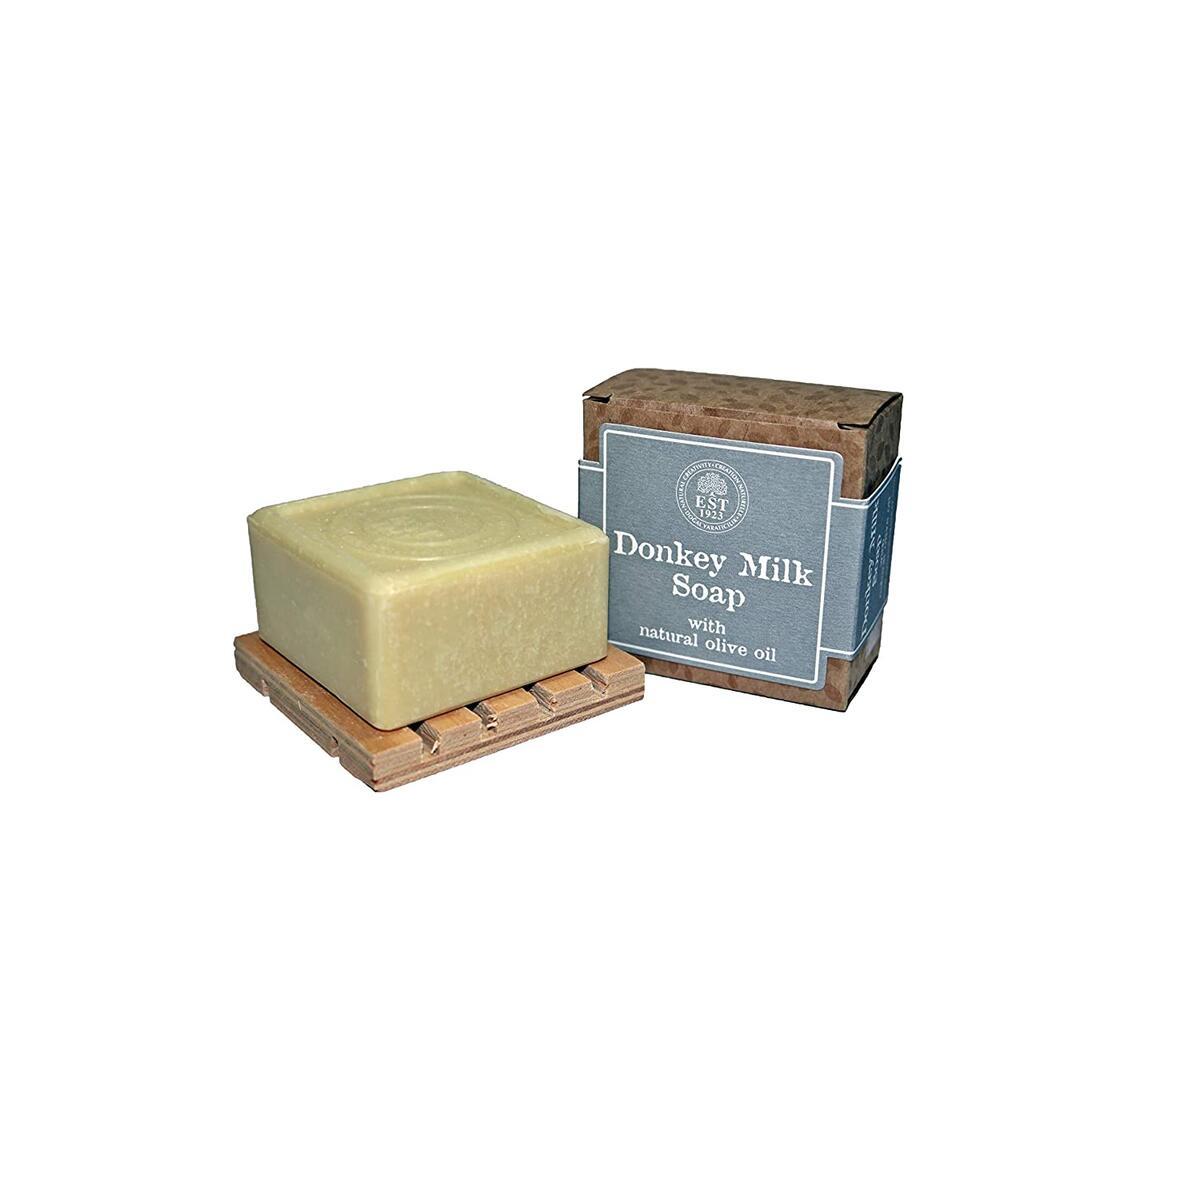 Donkey Milk Vegetarian Soap Bar - EST1923, Donkey Milk Soap, Donkey Milk Products for All Skin Types, Donkey Milk Skin Care, Vegetarian Soap Bar, Unscented Bar Soap, Paraben Free, Unisex